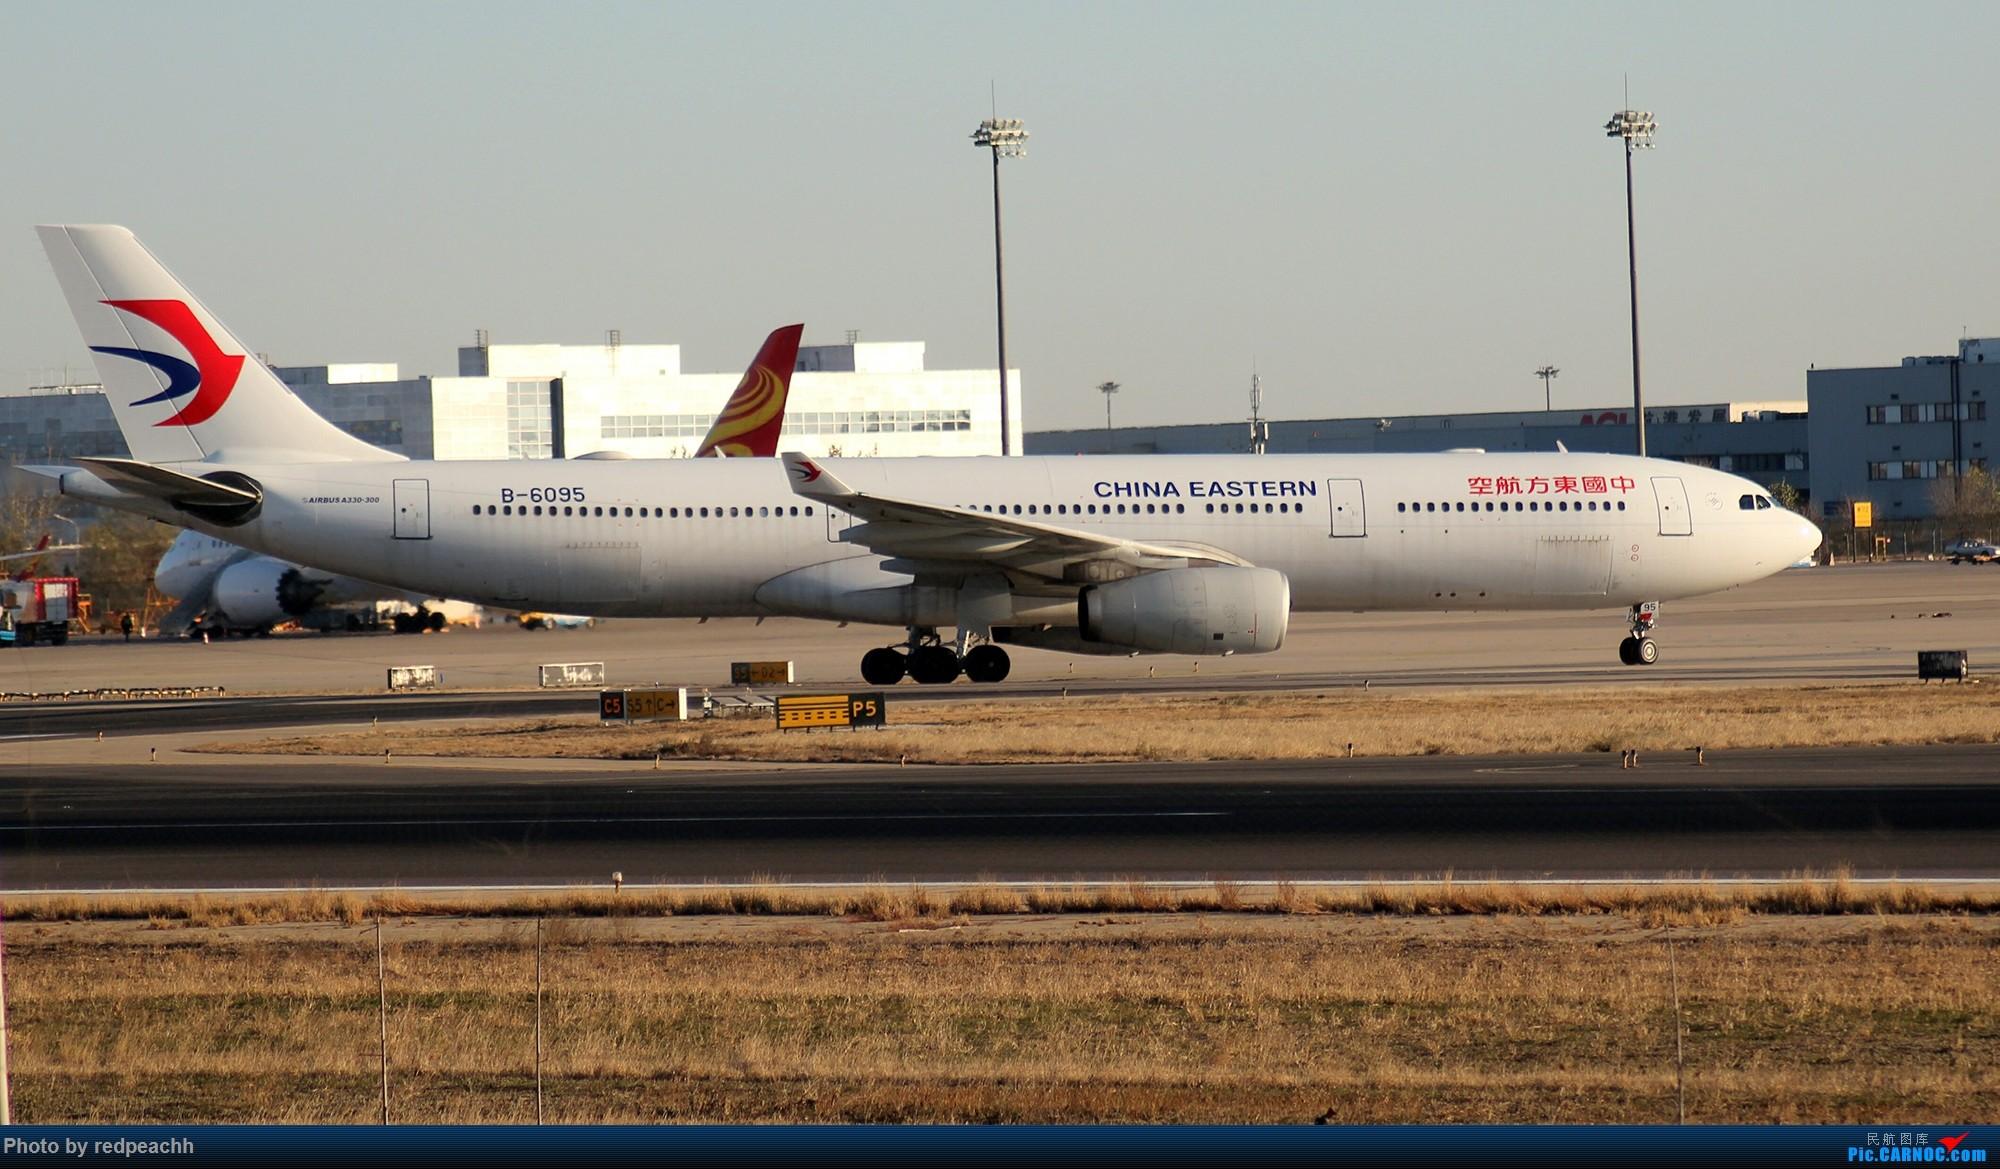 Re:[原创](持续更新)河北人为拍机而首都机场2日游(杨二营、八卦台)虽均为常规货但值得纪念(36L) AIRBUS A330-300 B-6095 中国北京首都国际机场